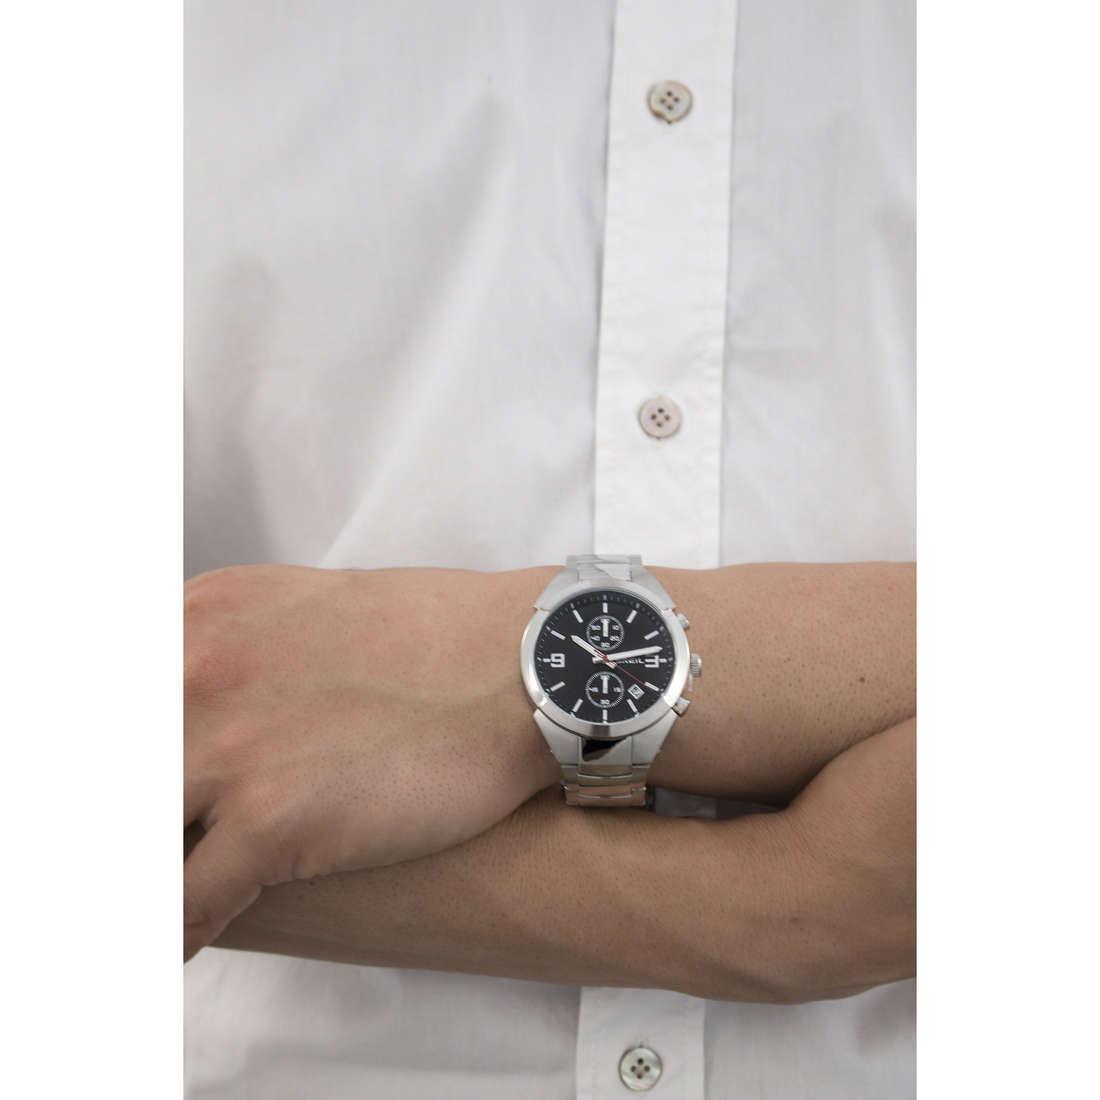 Breil cronografi Gap uomo TW1474 indosso